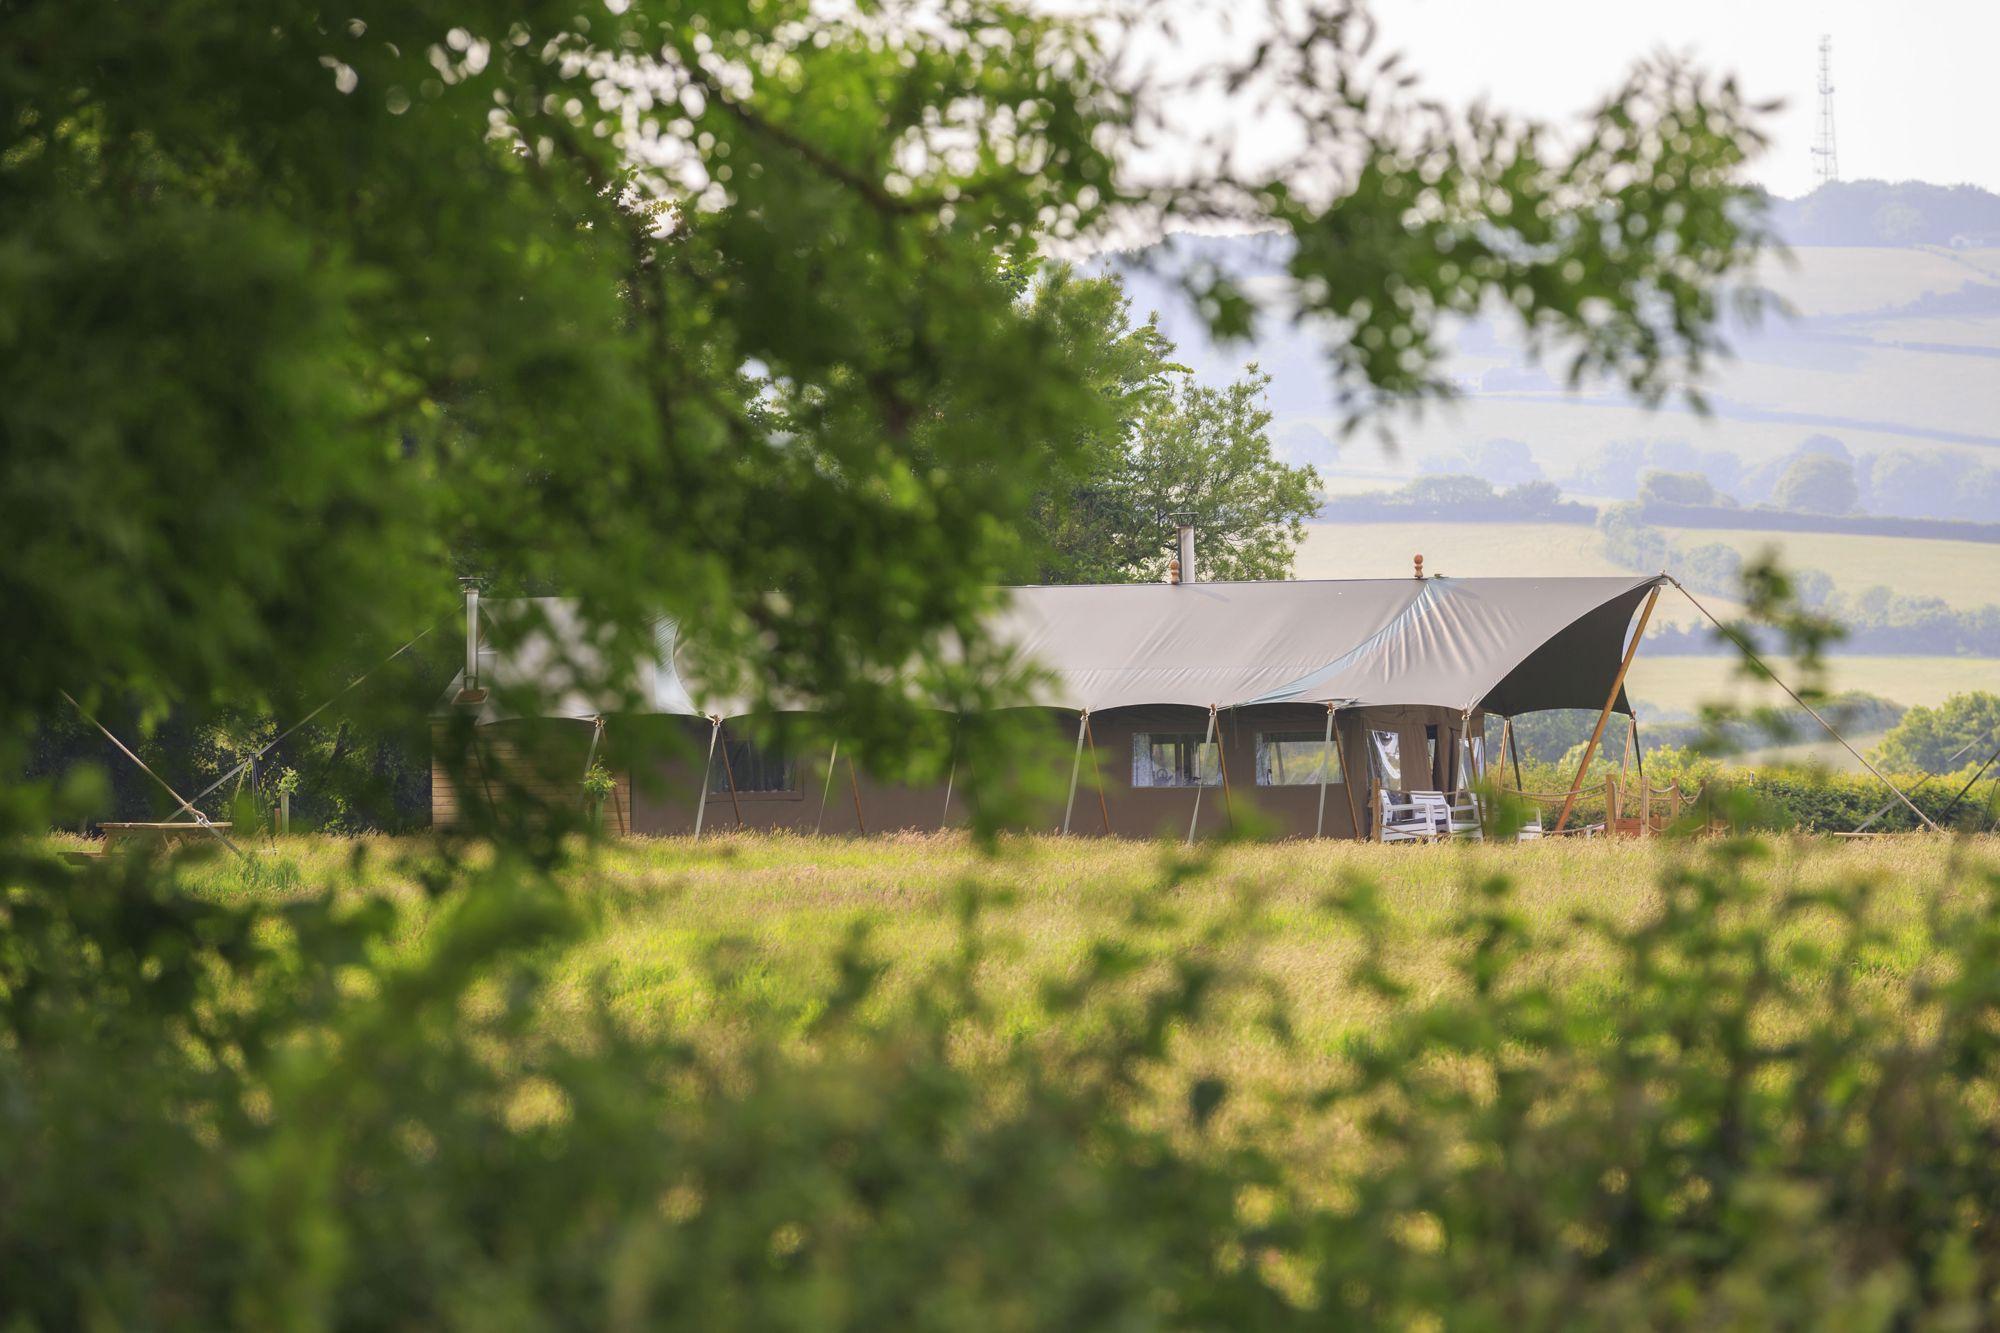 Ilminster Camping | Best campsites in Ilminster, Somerset